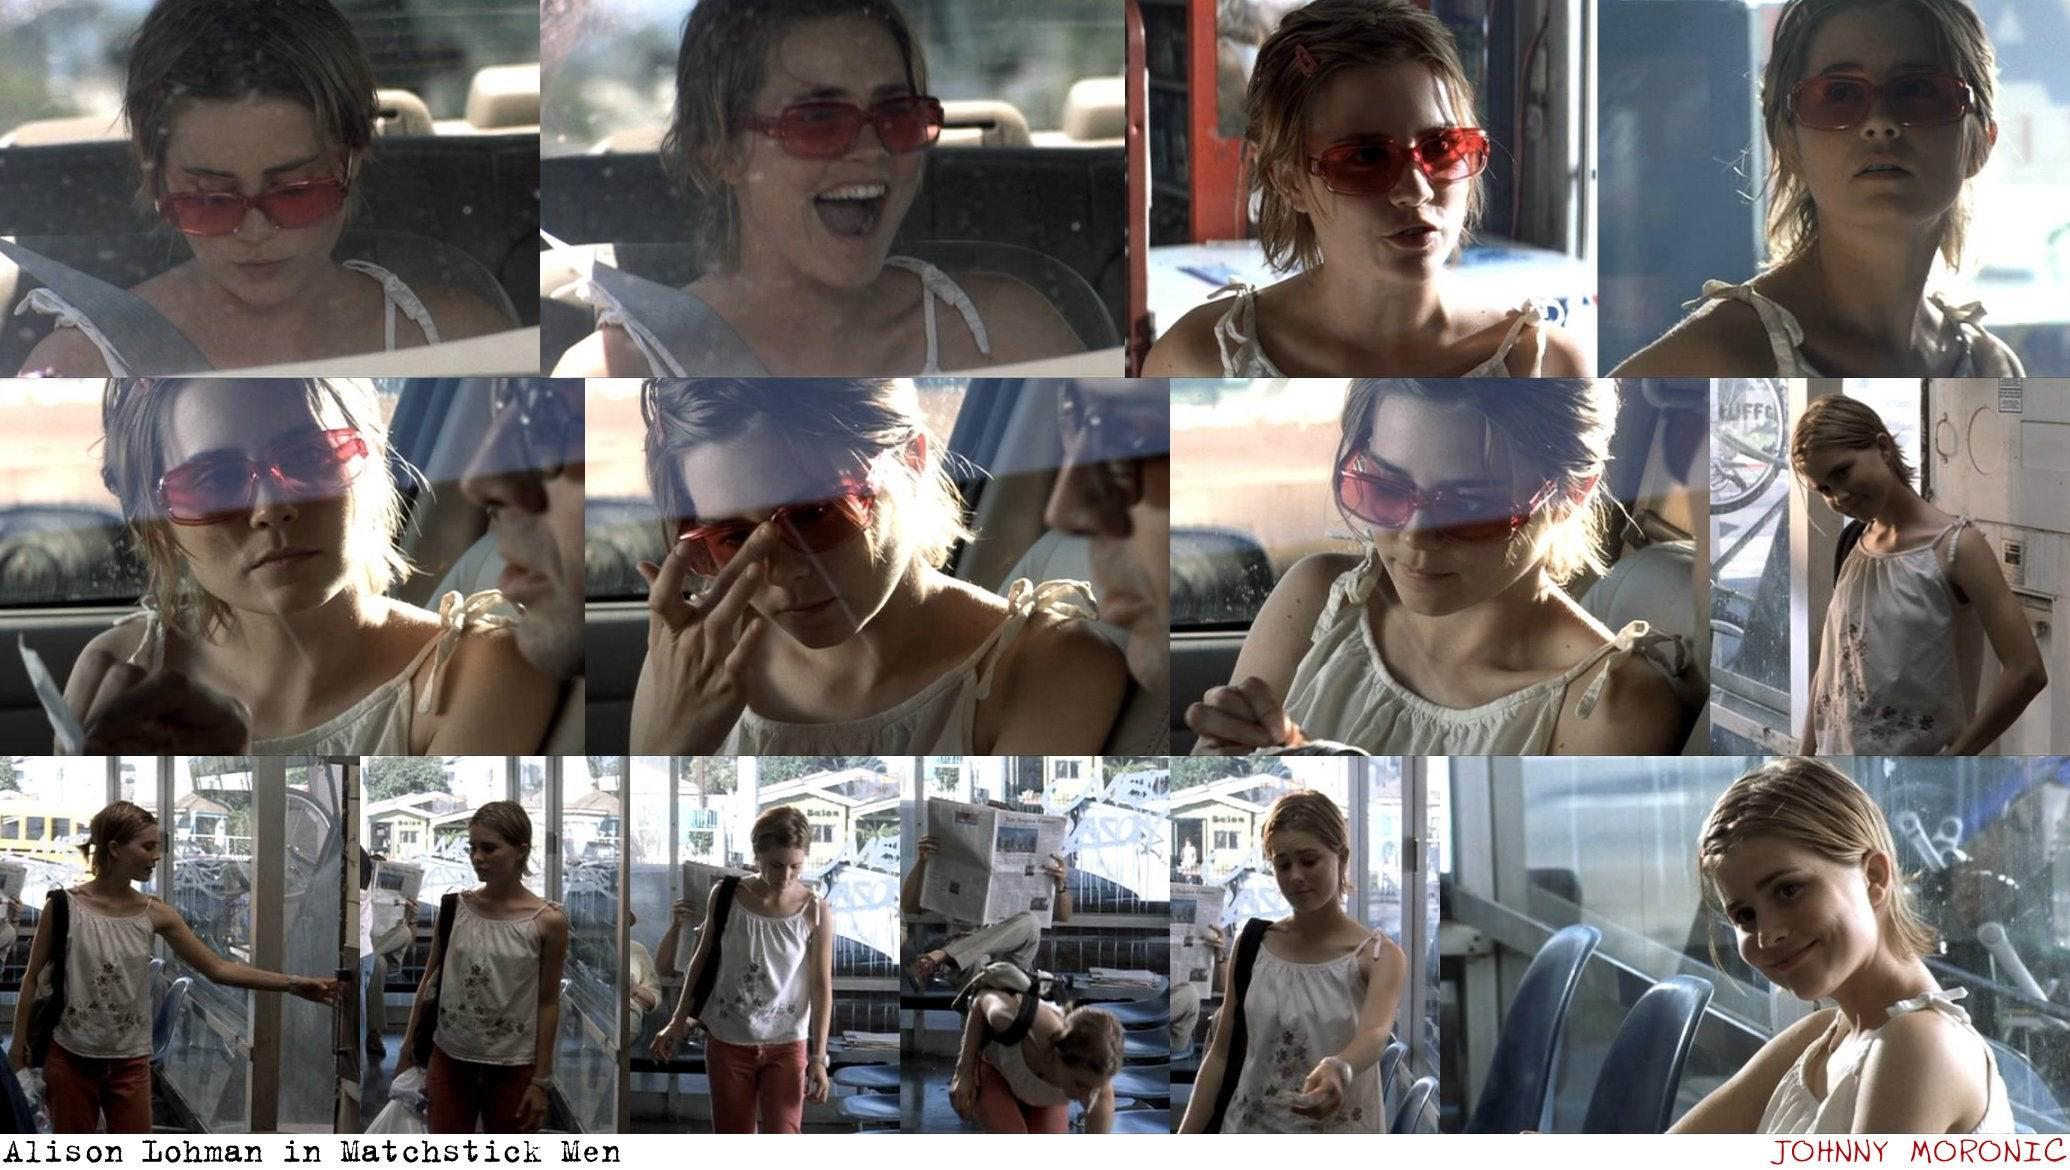 Japanese imagefap panty flash pics